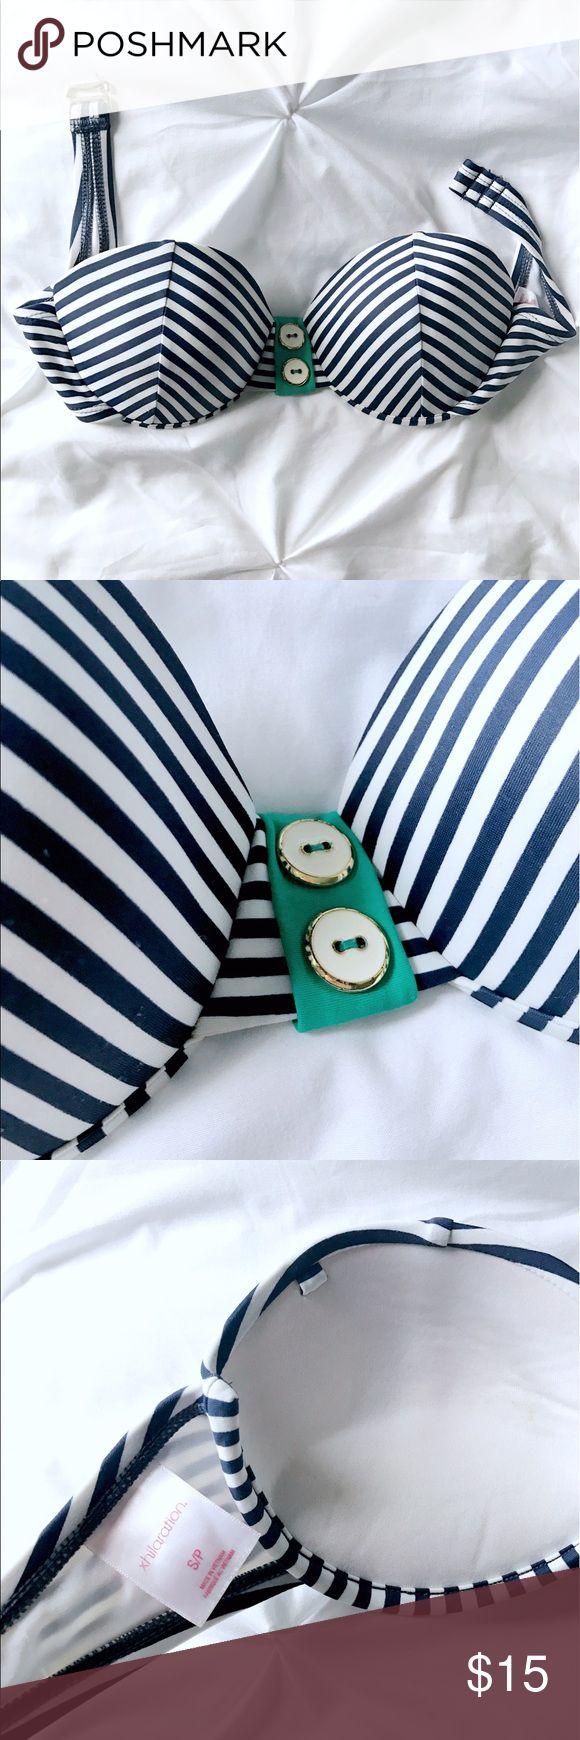 Nautical navy and white striped bandeau bikini top Navy and white striped nautical bikini top. With green button detail. Slight push up. Like new! Xhilaration Swim Bikinis